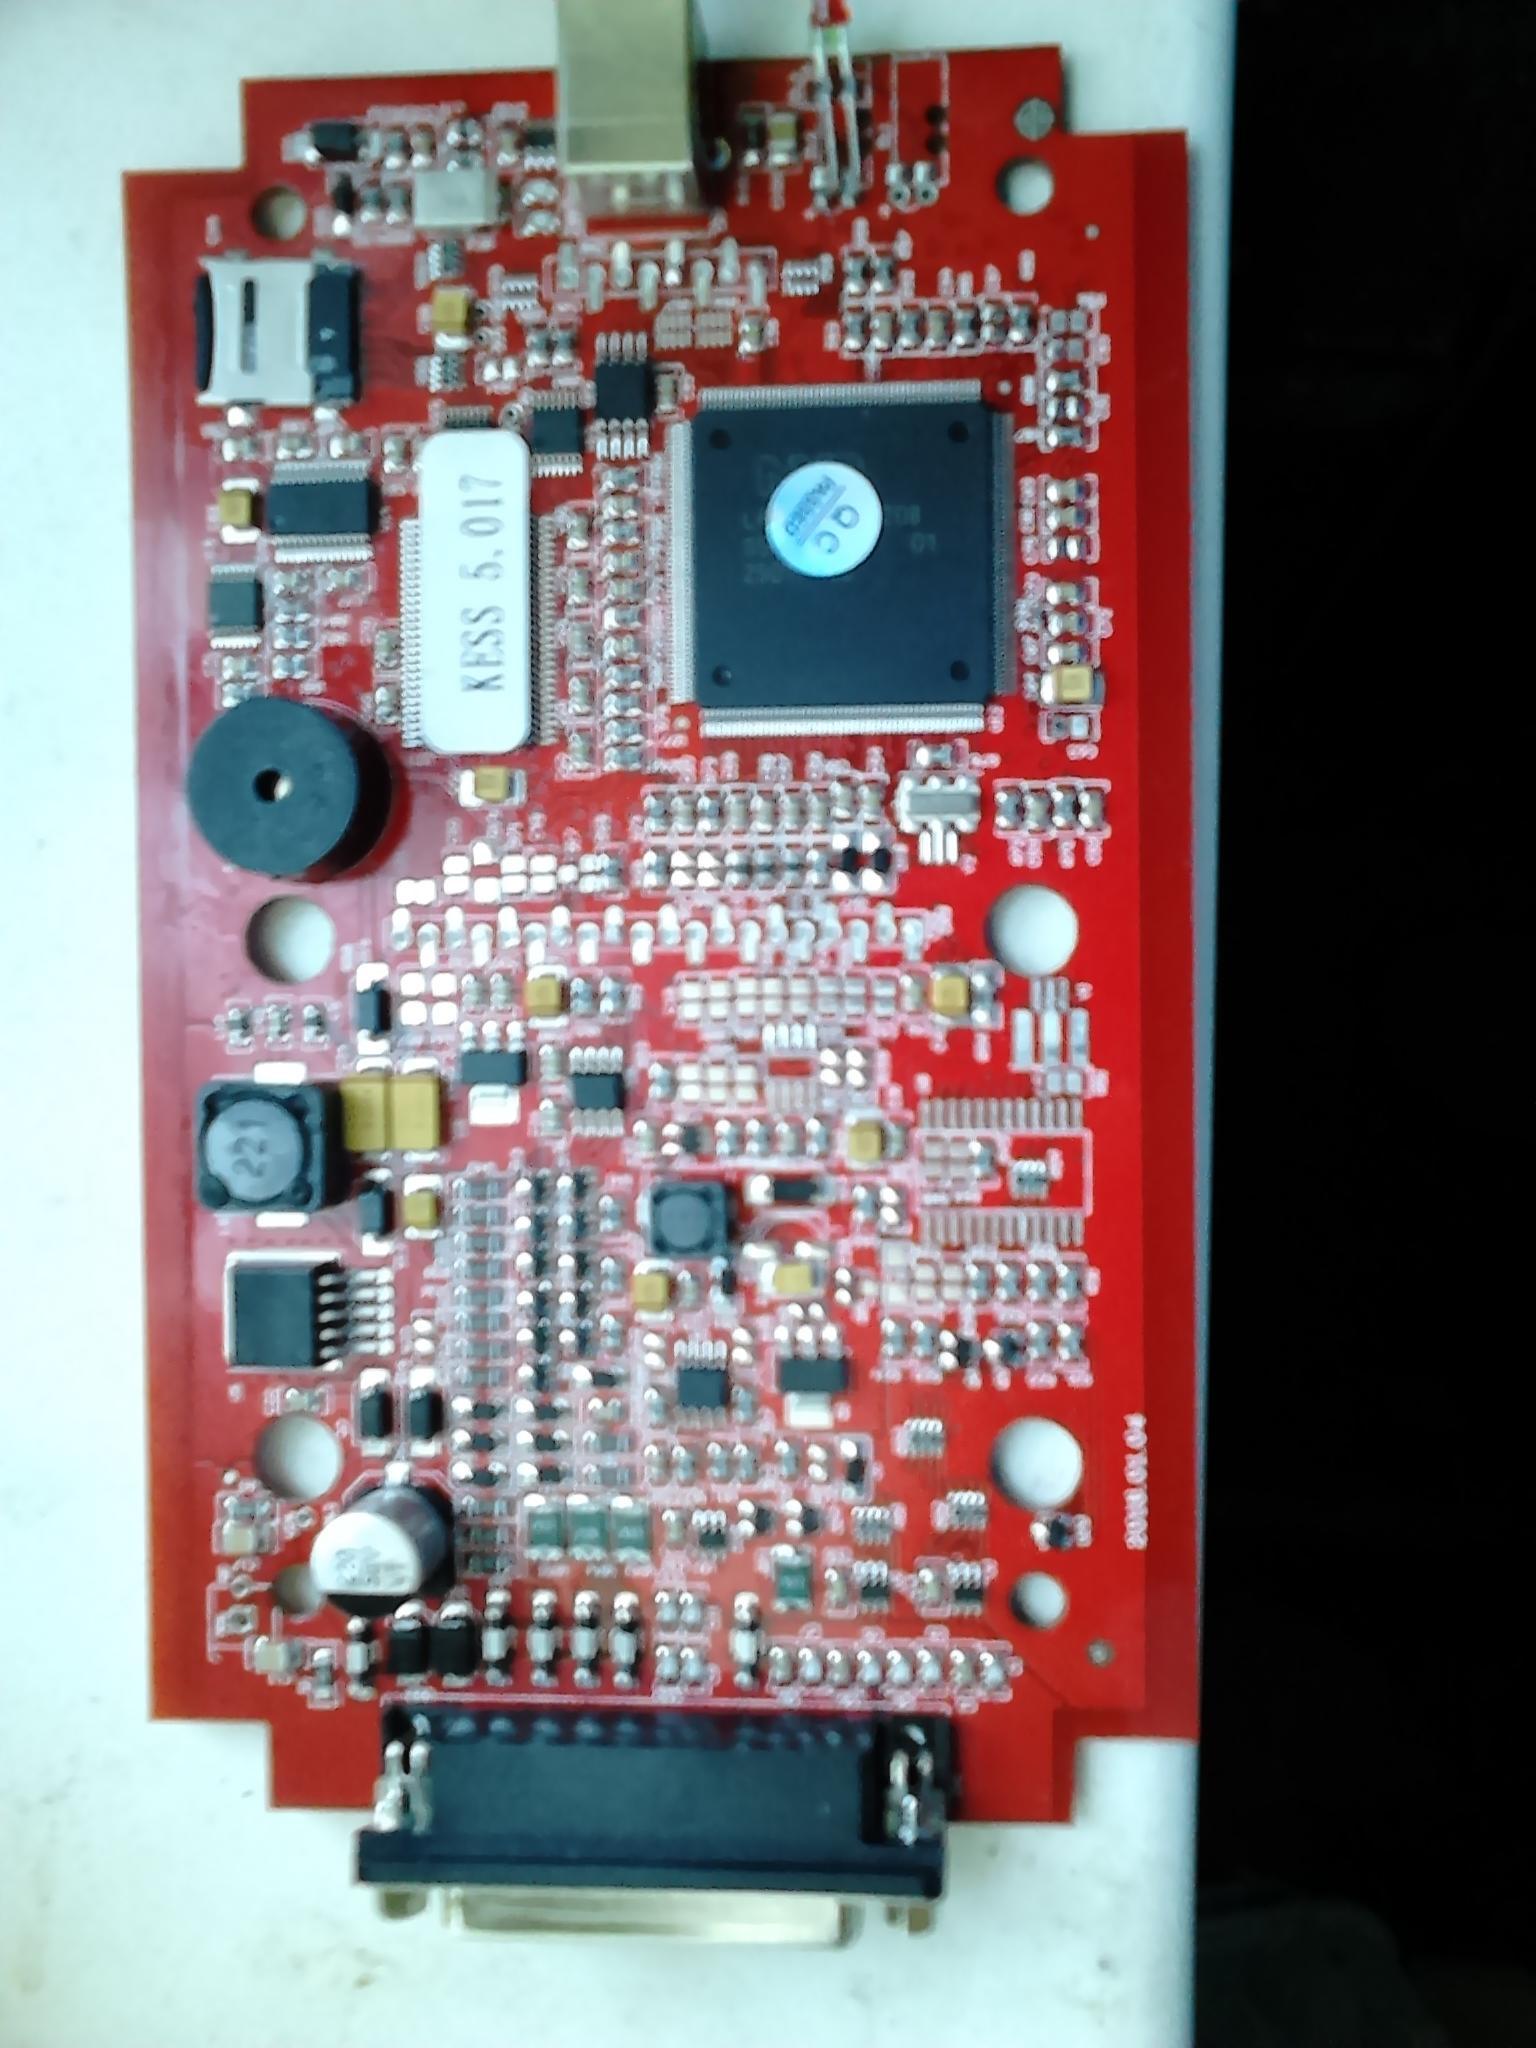 KESS V5 017 - Страница 3 - Kess - Форум автомастеров